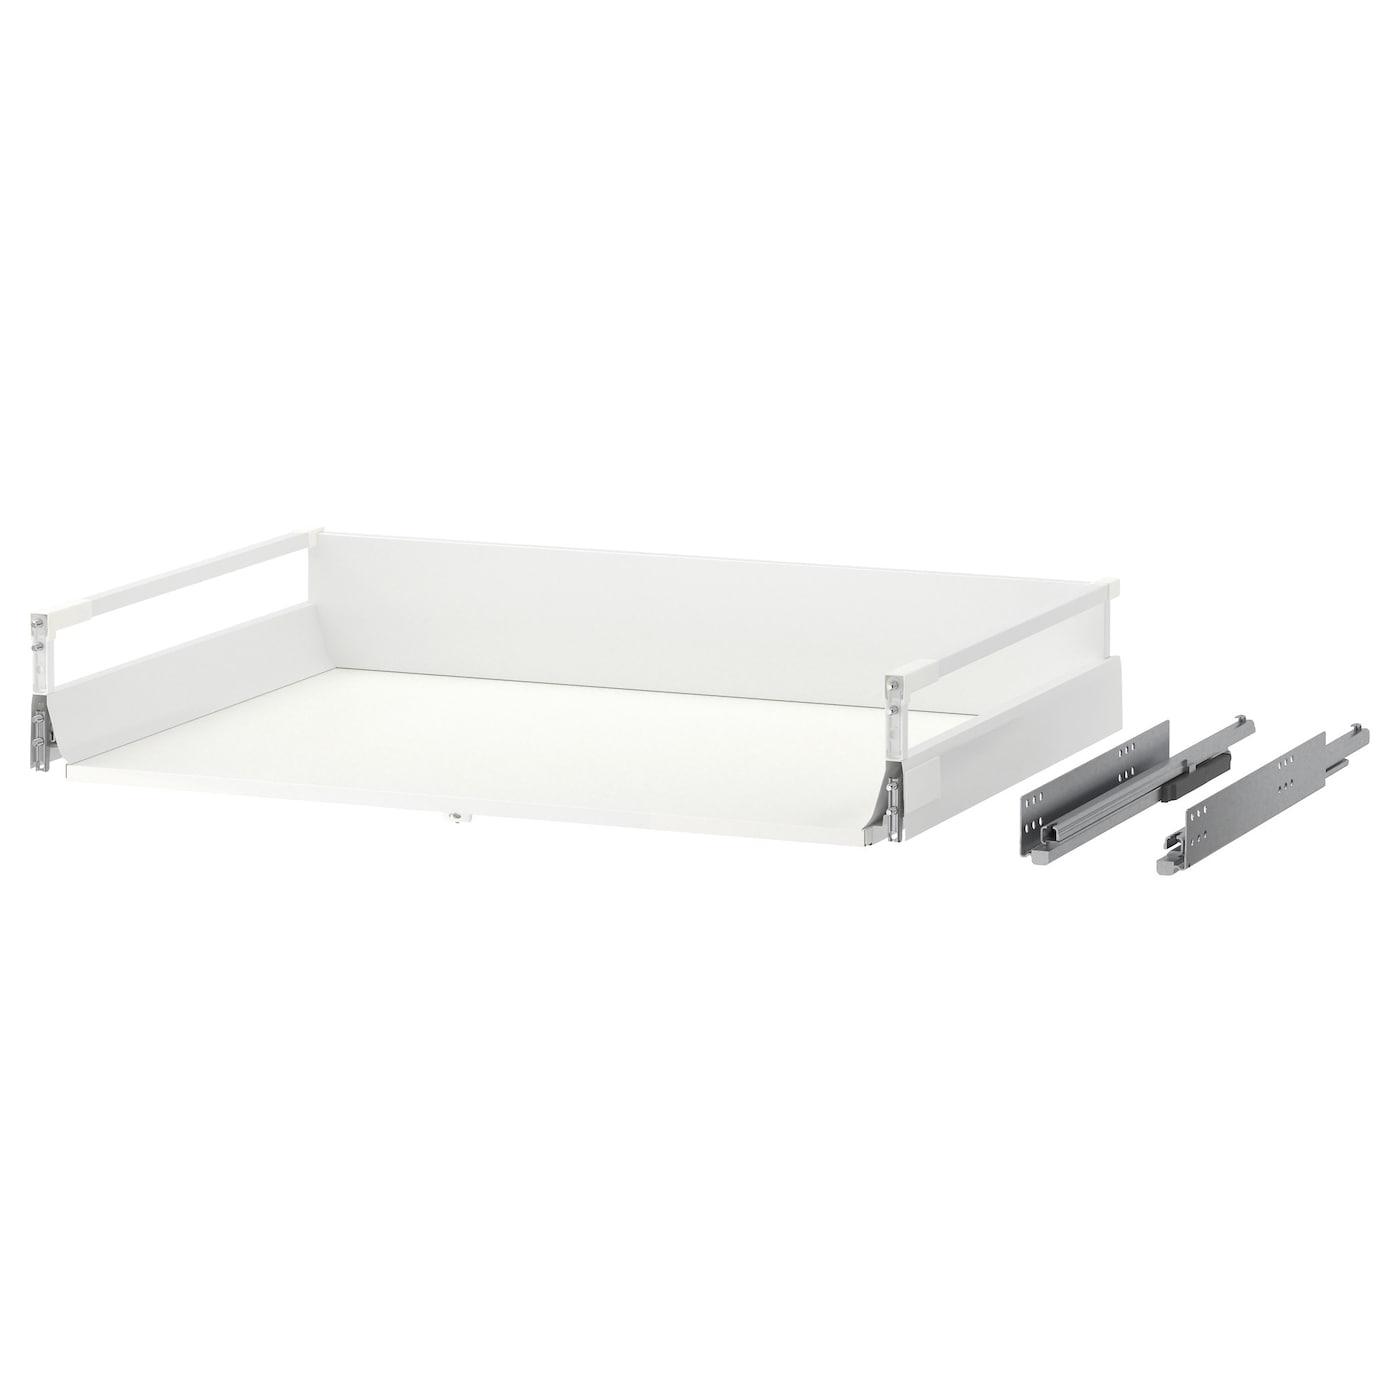 utrusta face de tiroir moyen blanc 80 cm ikea. Black Bedroom Furniture Sets. Home Design Ideas